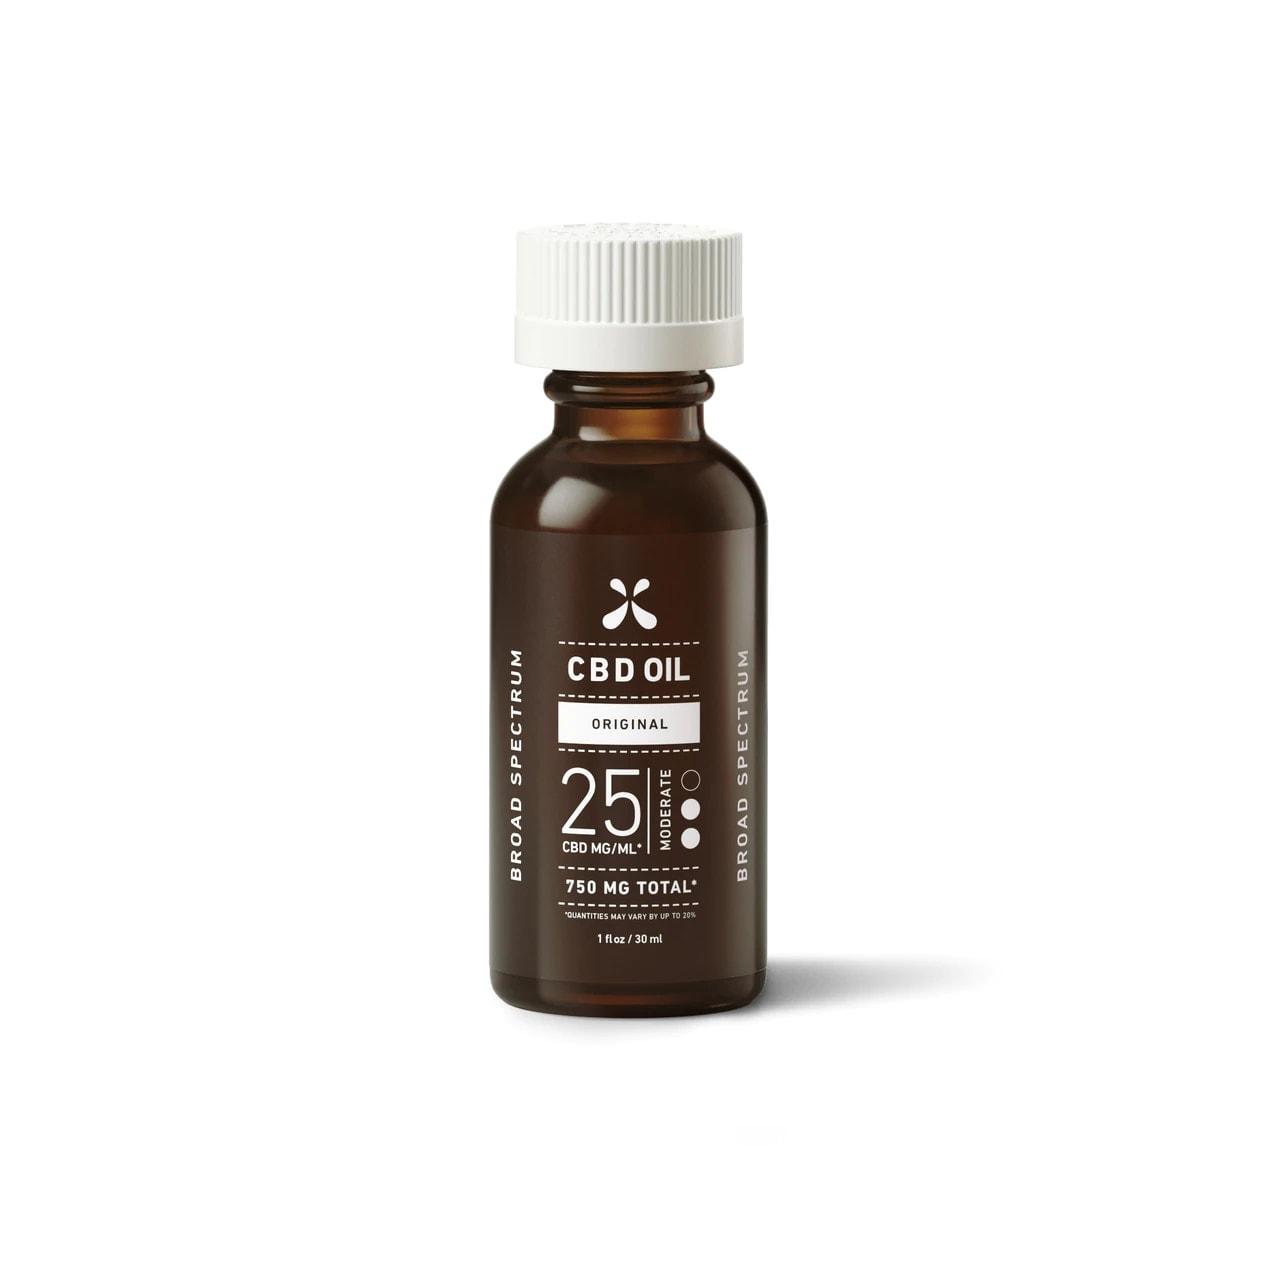 Green Roads, CBD Oil, Broad Spectrum THC-Free, Natural Flavor, 1oz, 25MG:ML, 750mg of CBD3